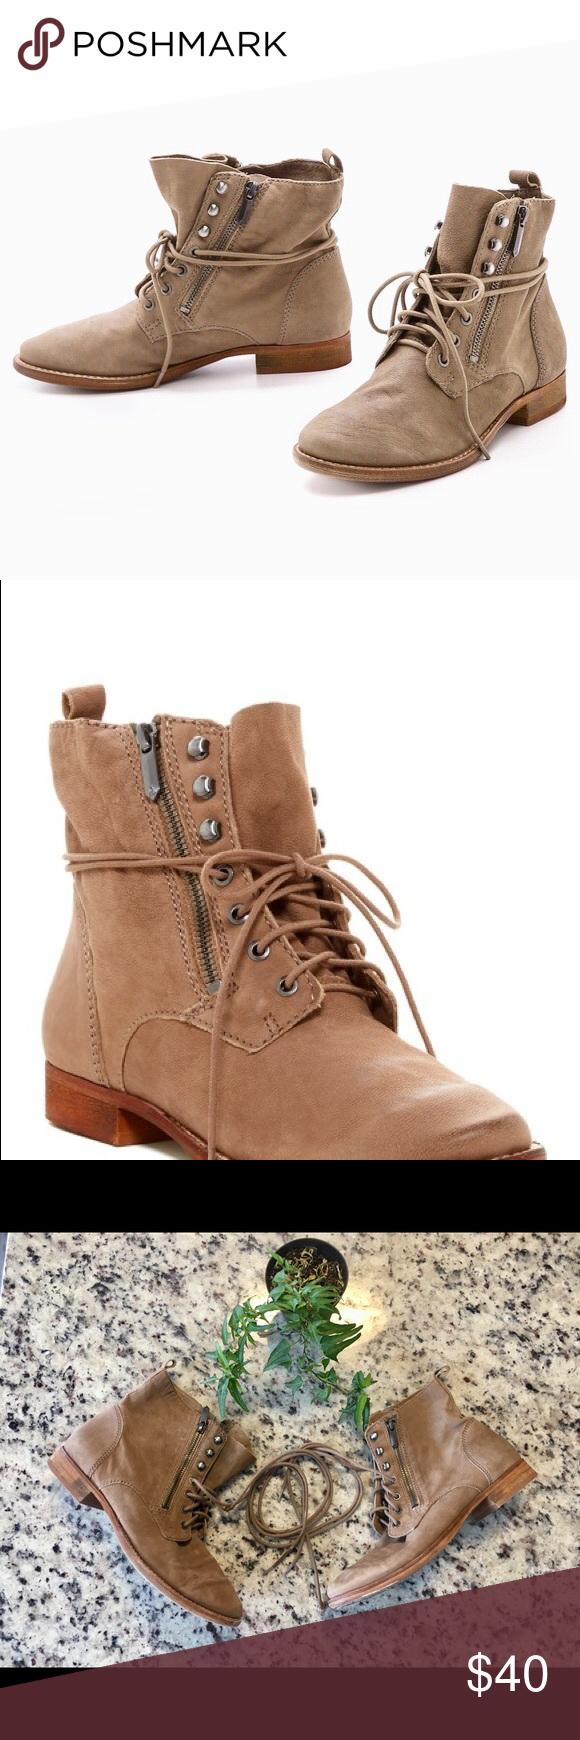 7e1e887973d89 Sam Edelman mackay leather tan zipper ankle boots Sam Edelman Mackay leather  ankle boots No size